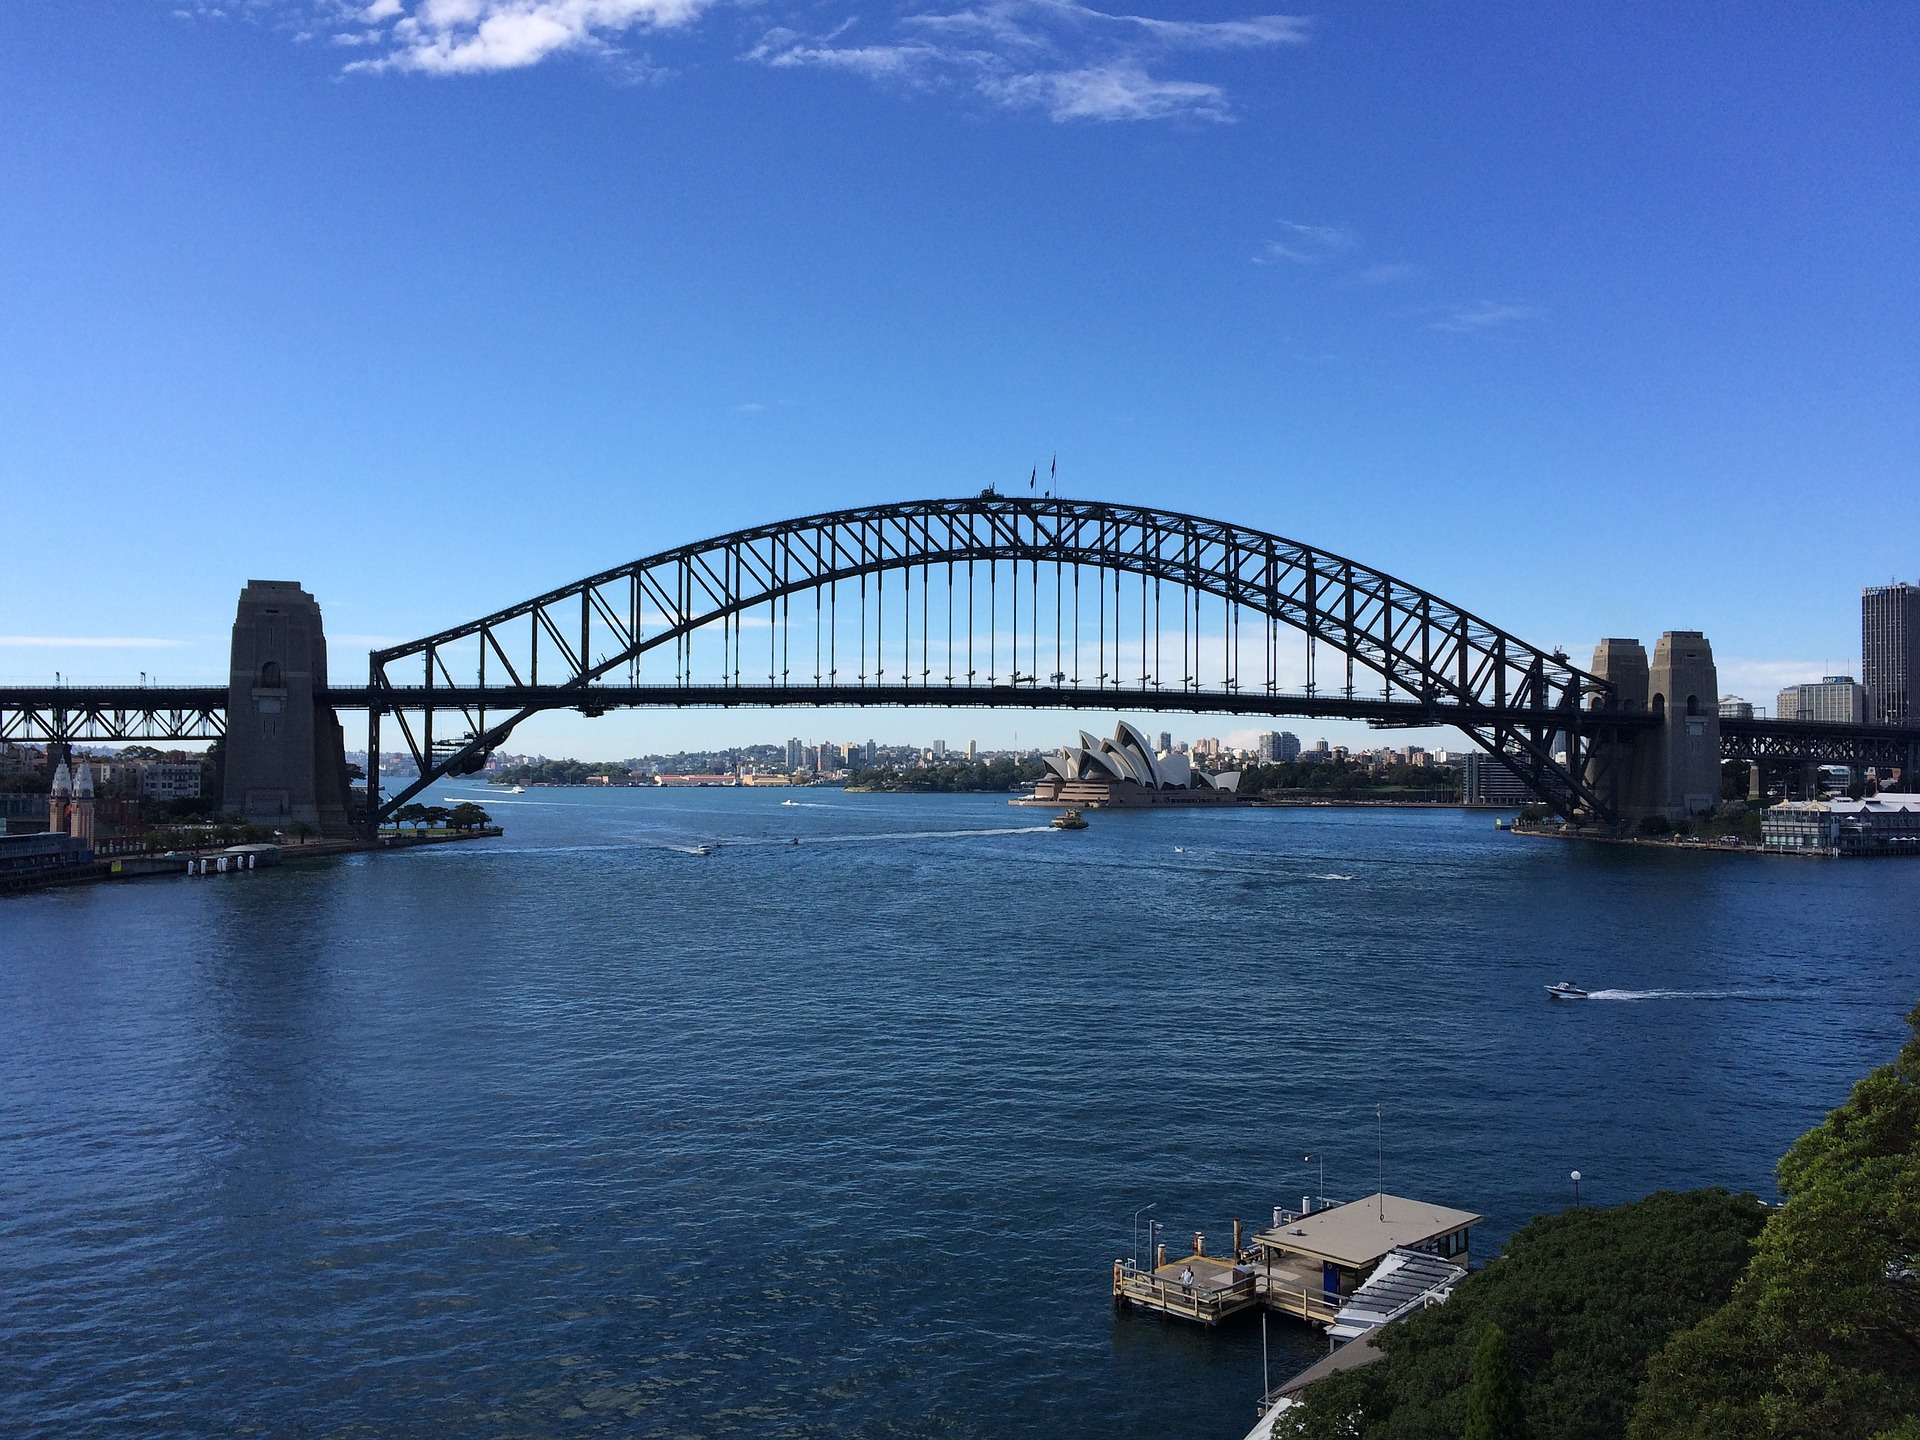 Sydney Harbour Bridge with Sydney Opera House in background, Australia